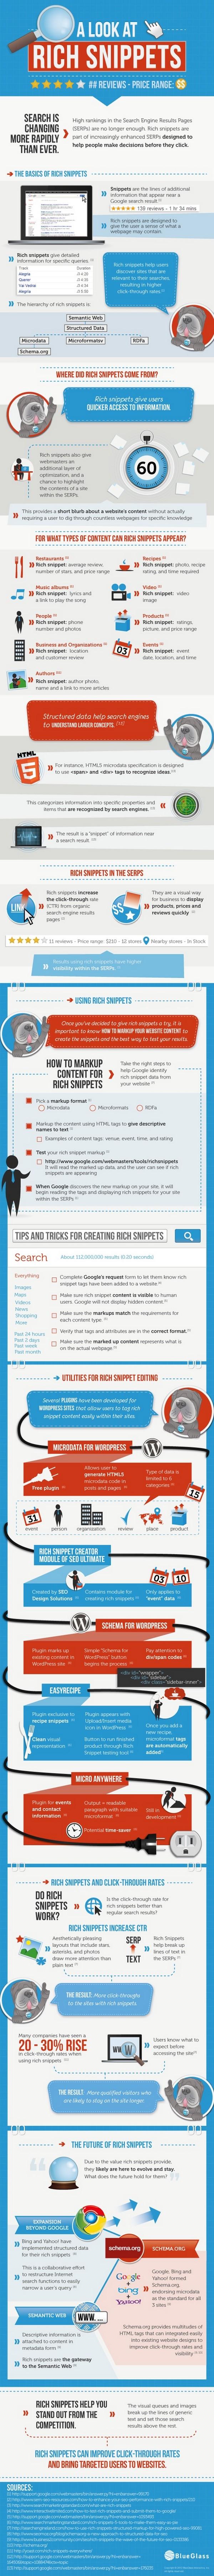 Infographie optimiser les rich snippets Google